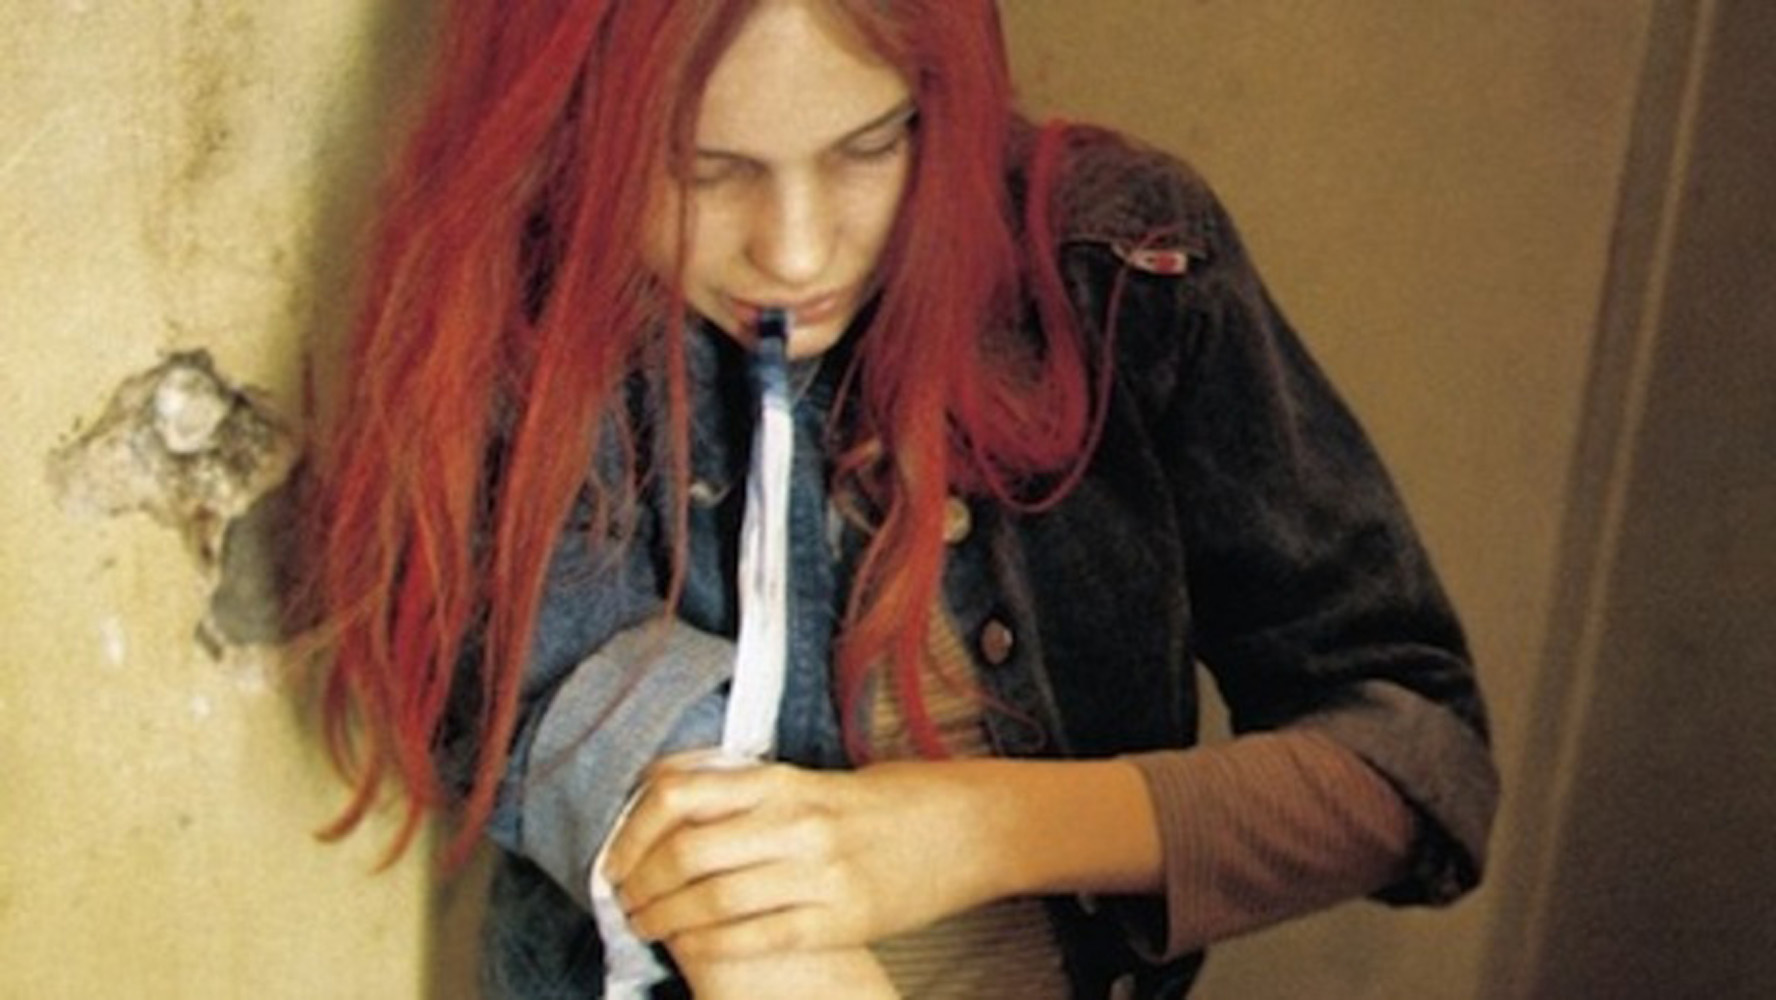 junkie heroin prostitute nasty